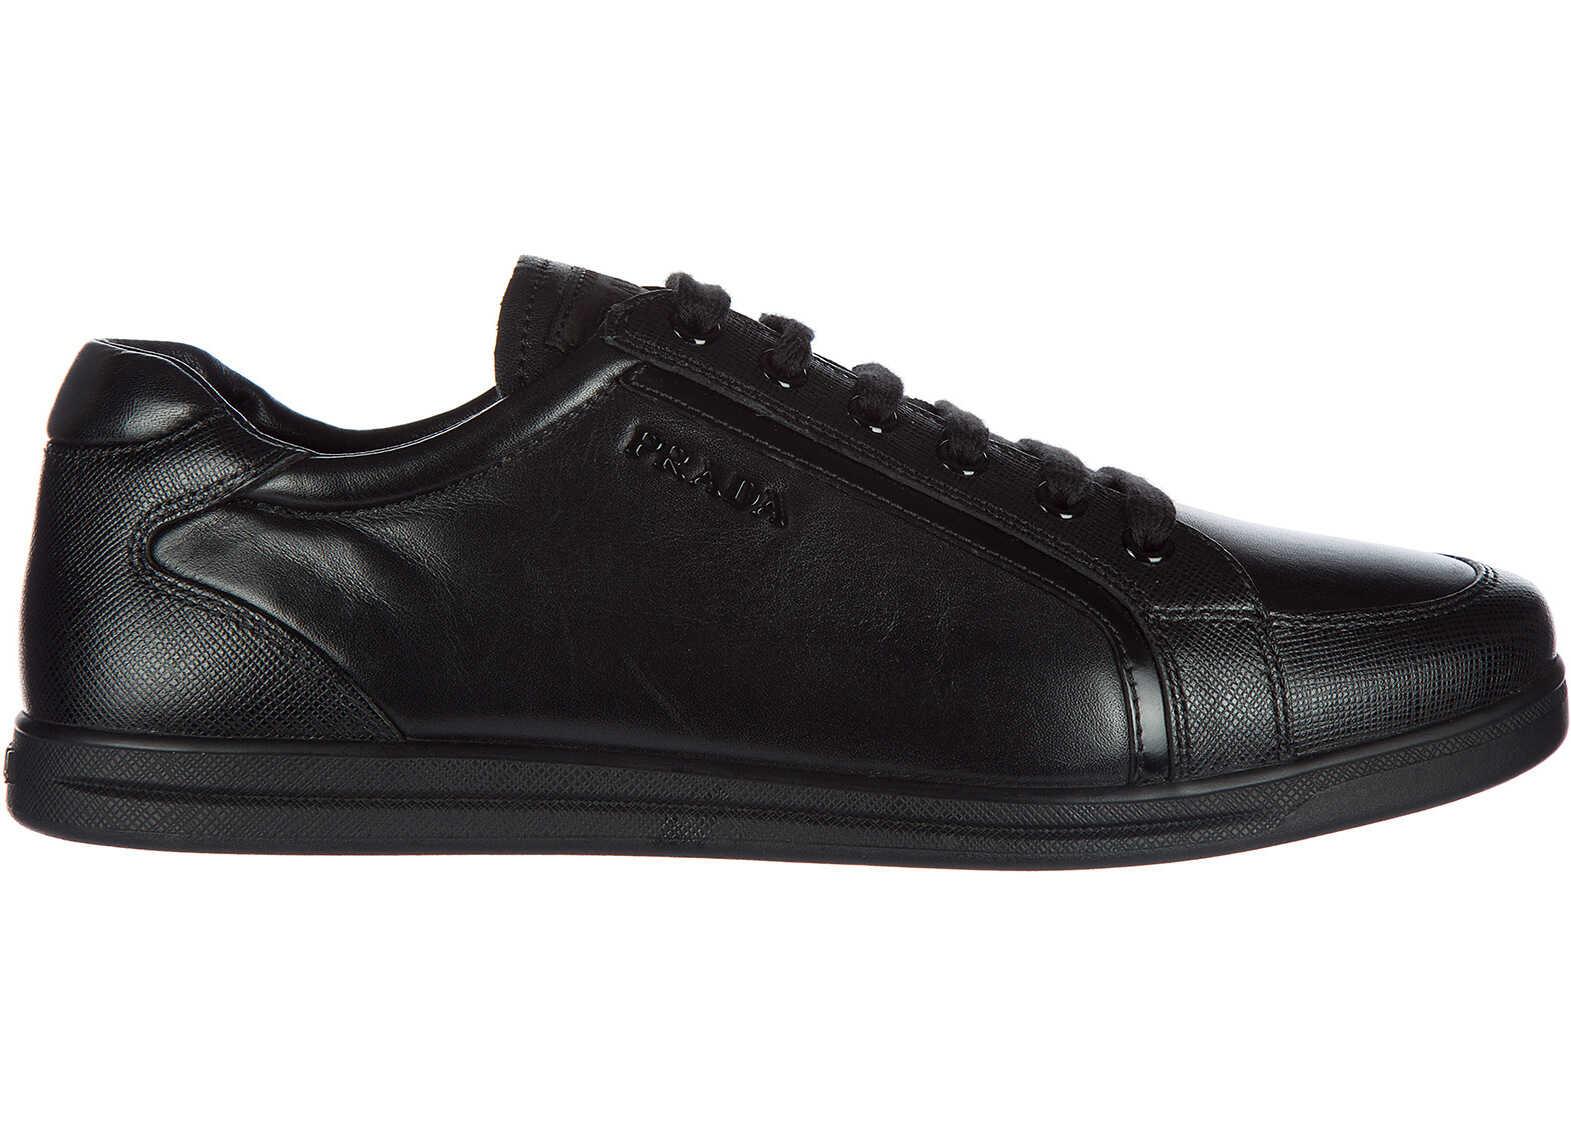 Prada Trainers Sneakers Black